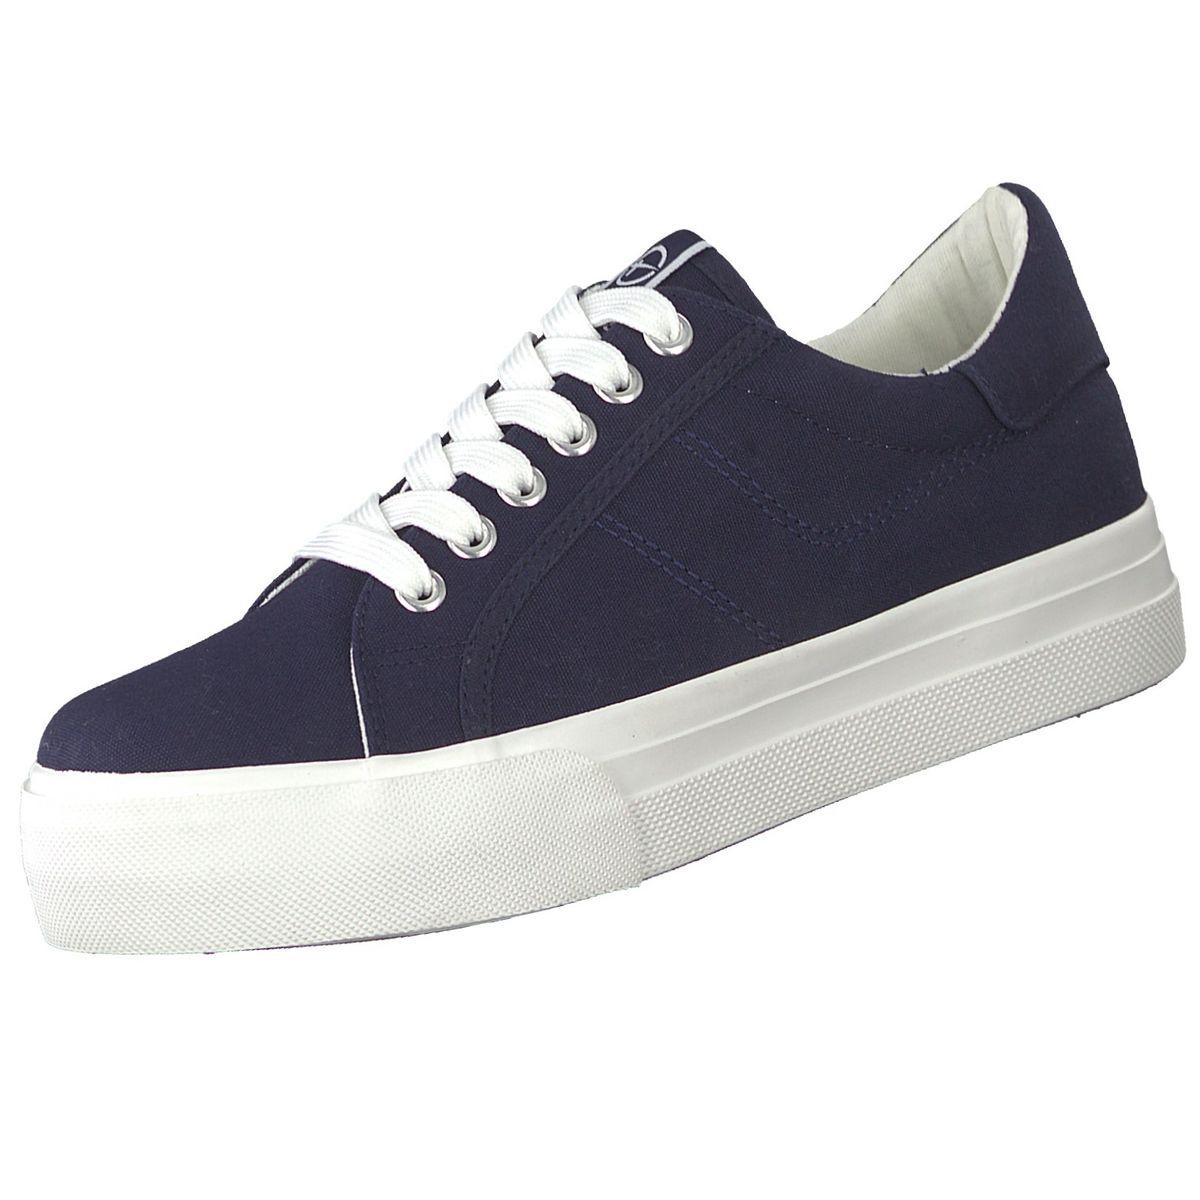 TAMARIS Damen Plateau Sneakers Blau   Trendbereich